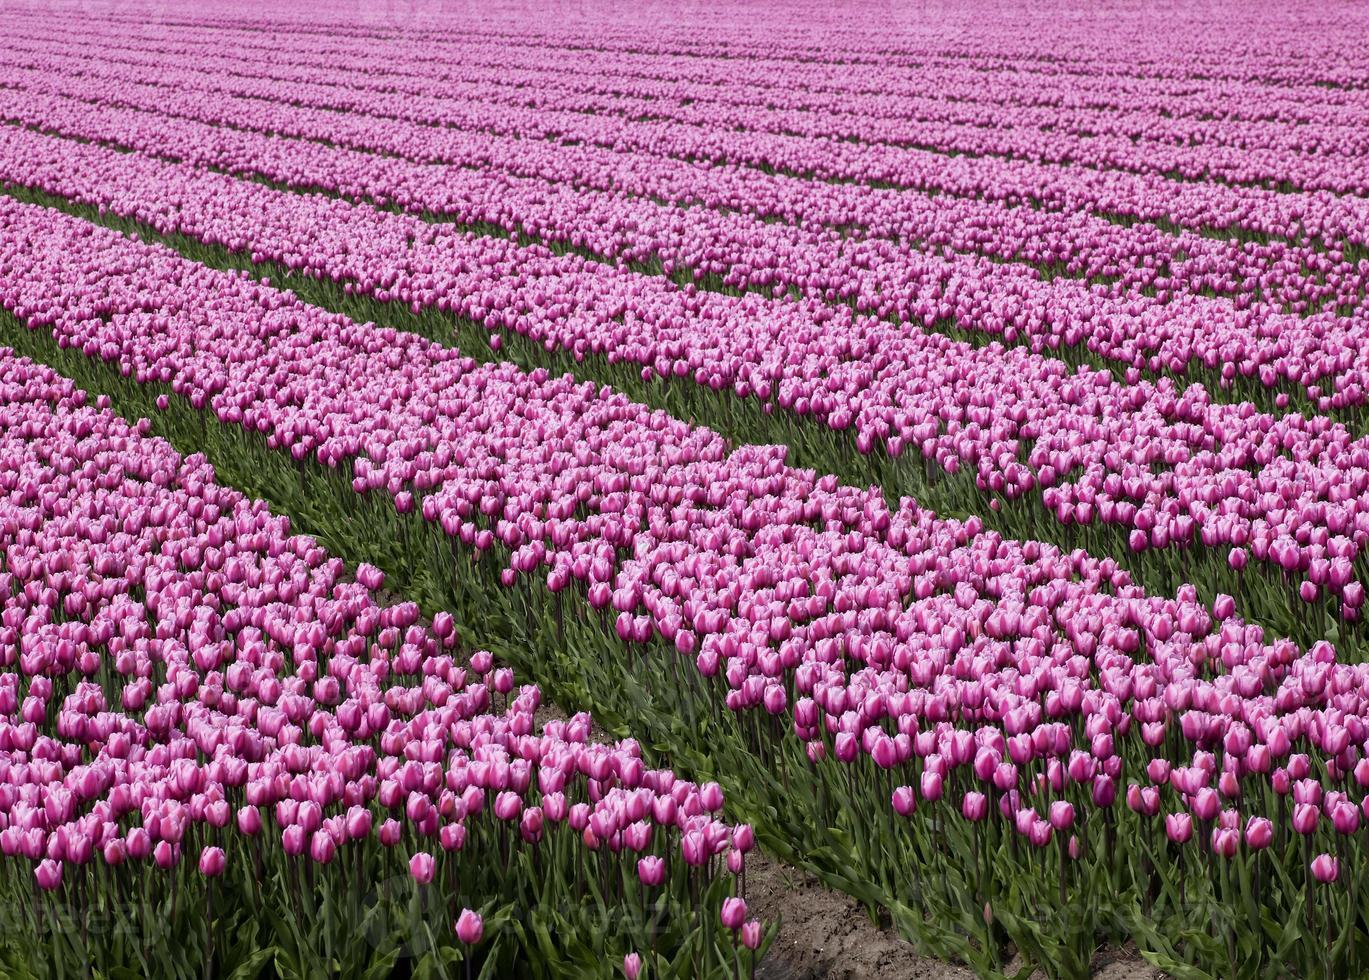 océan de tulipes roses photo